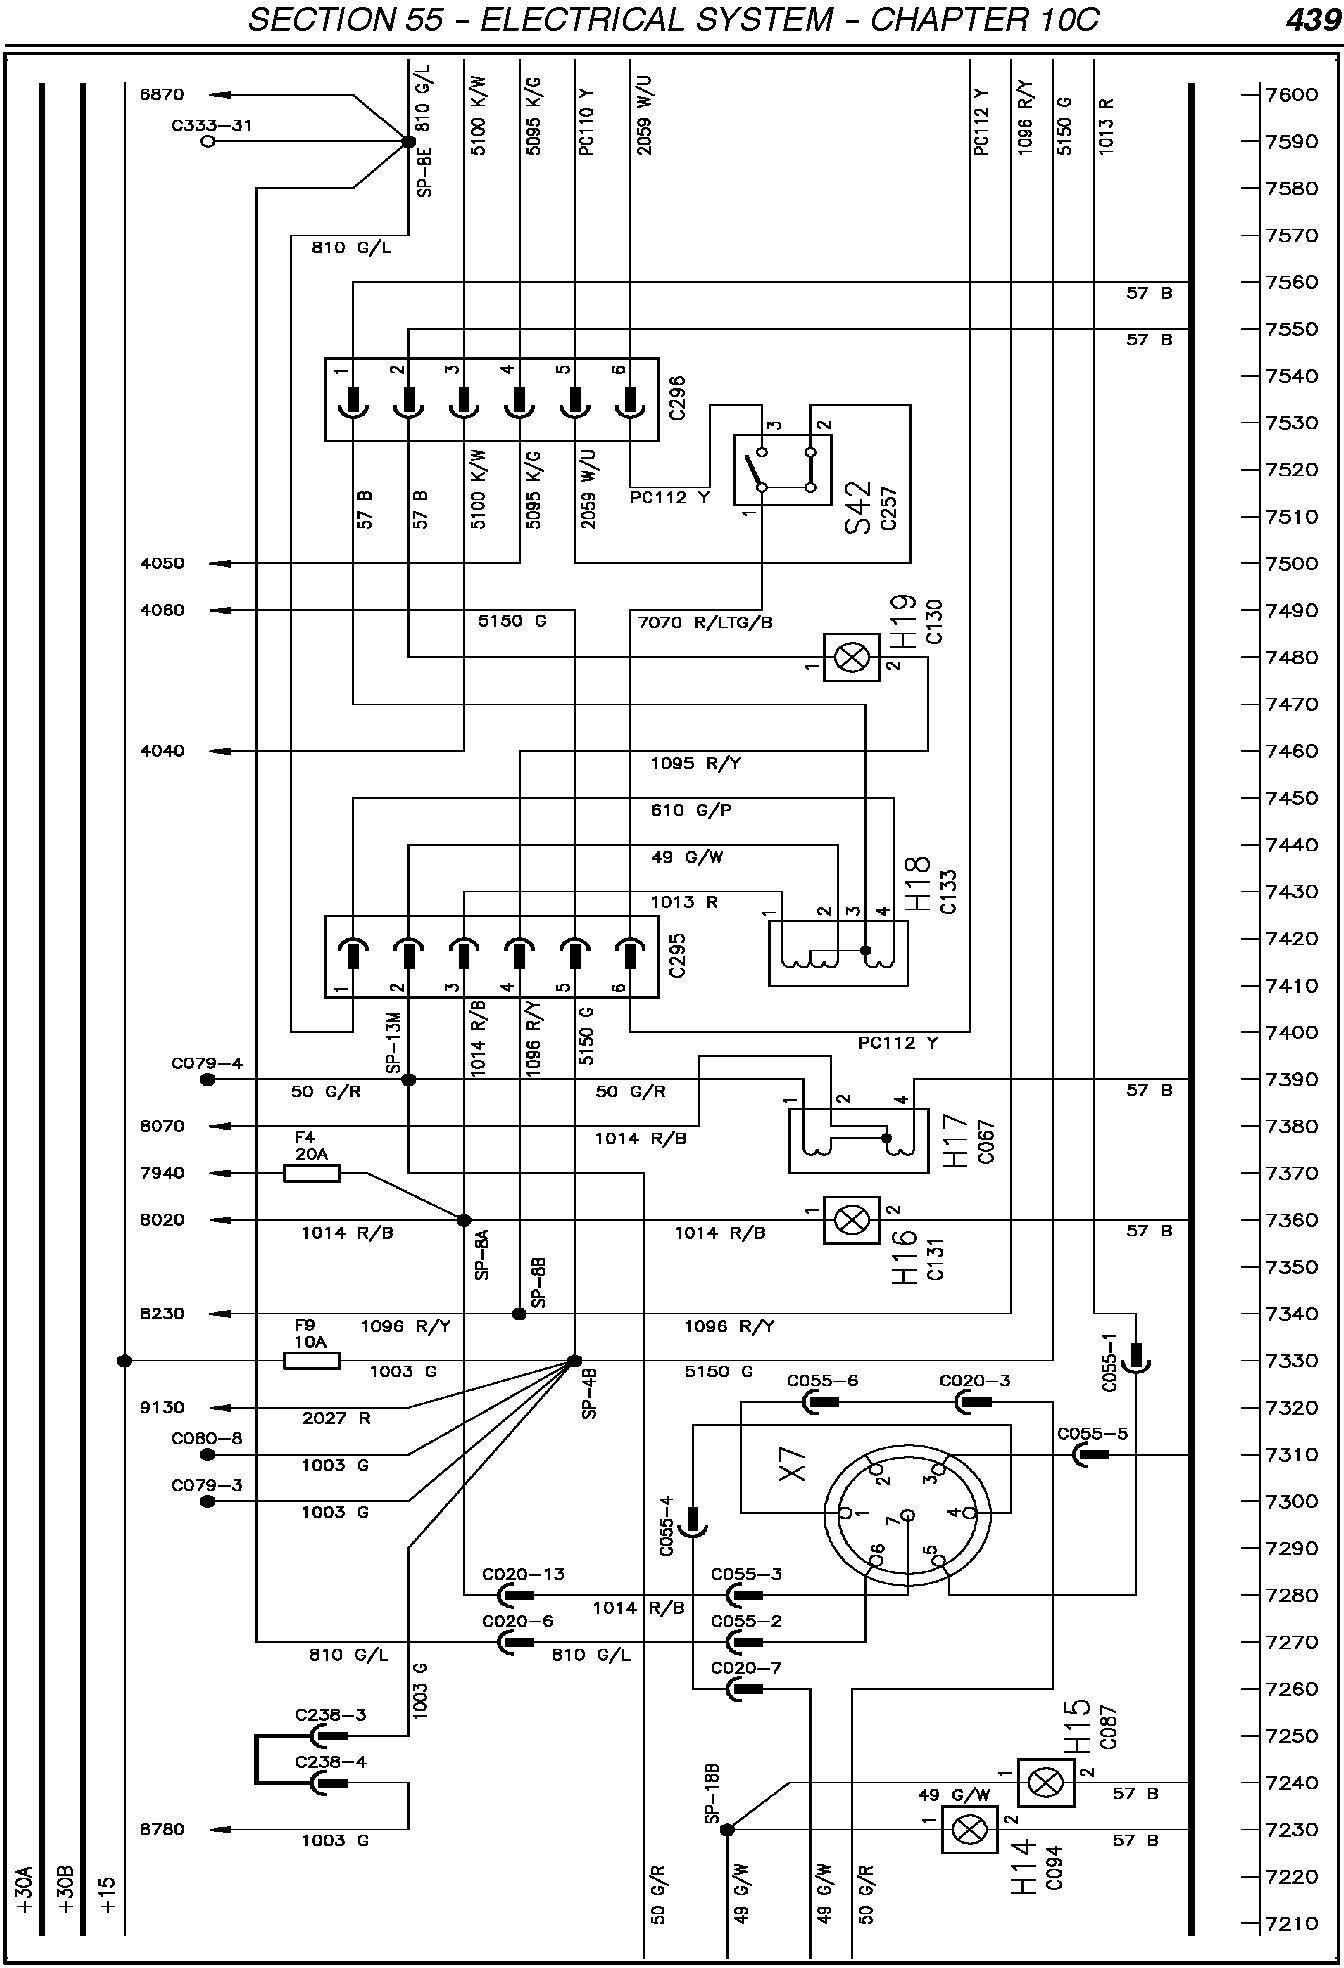 New Holland TM120/125/130/140/150/155, TM175-TM190 Tractor Fault Codes Diagnostic Service Manual - 3